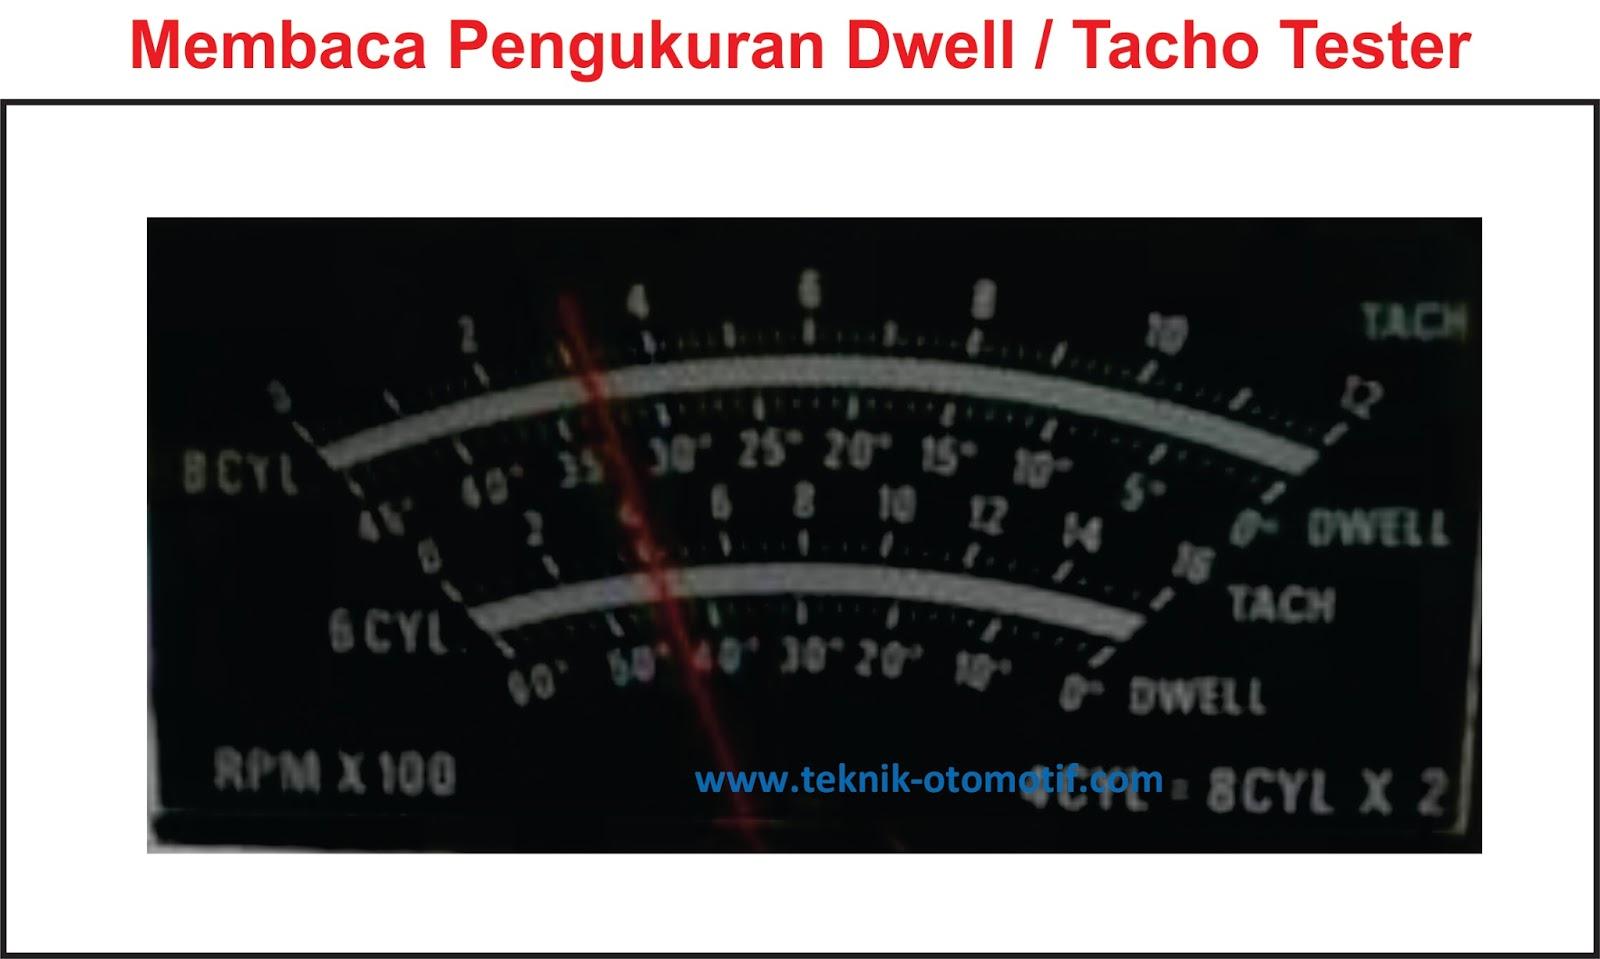 Fungsi Dwell dan Tacho Meter serta Cara Penggunaannya